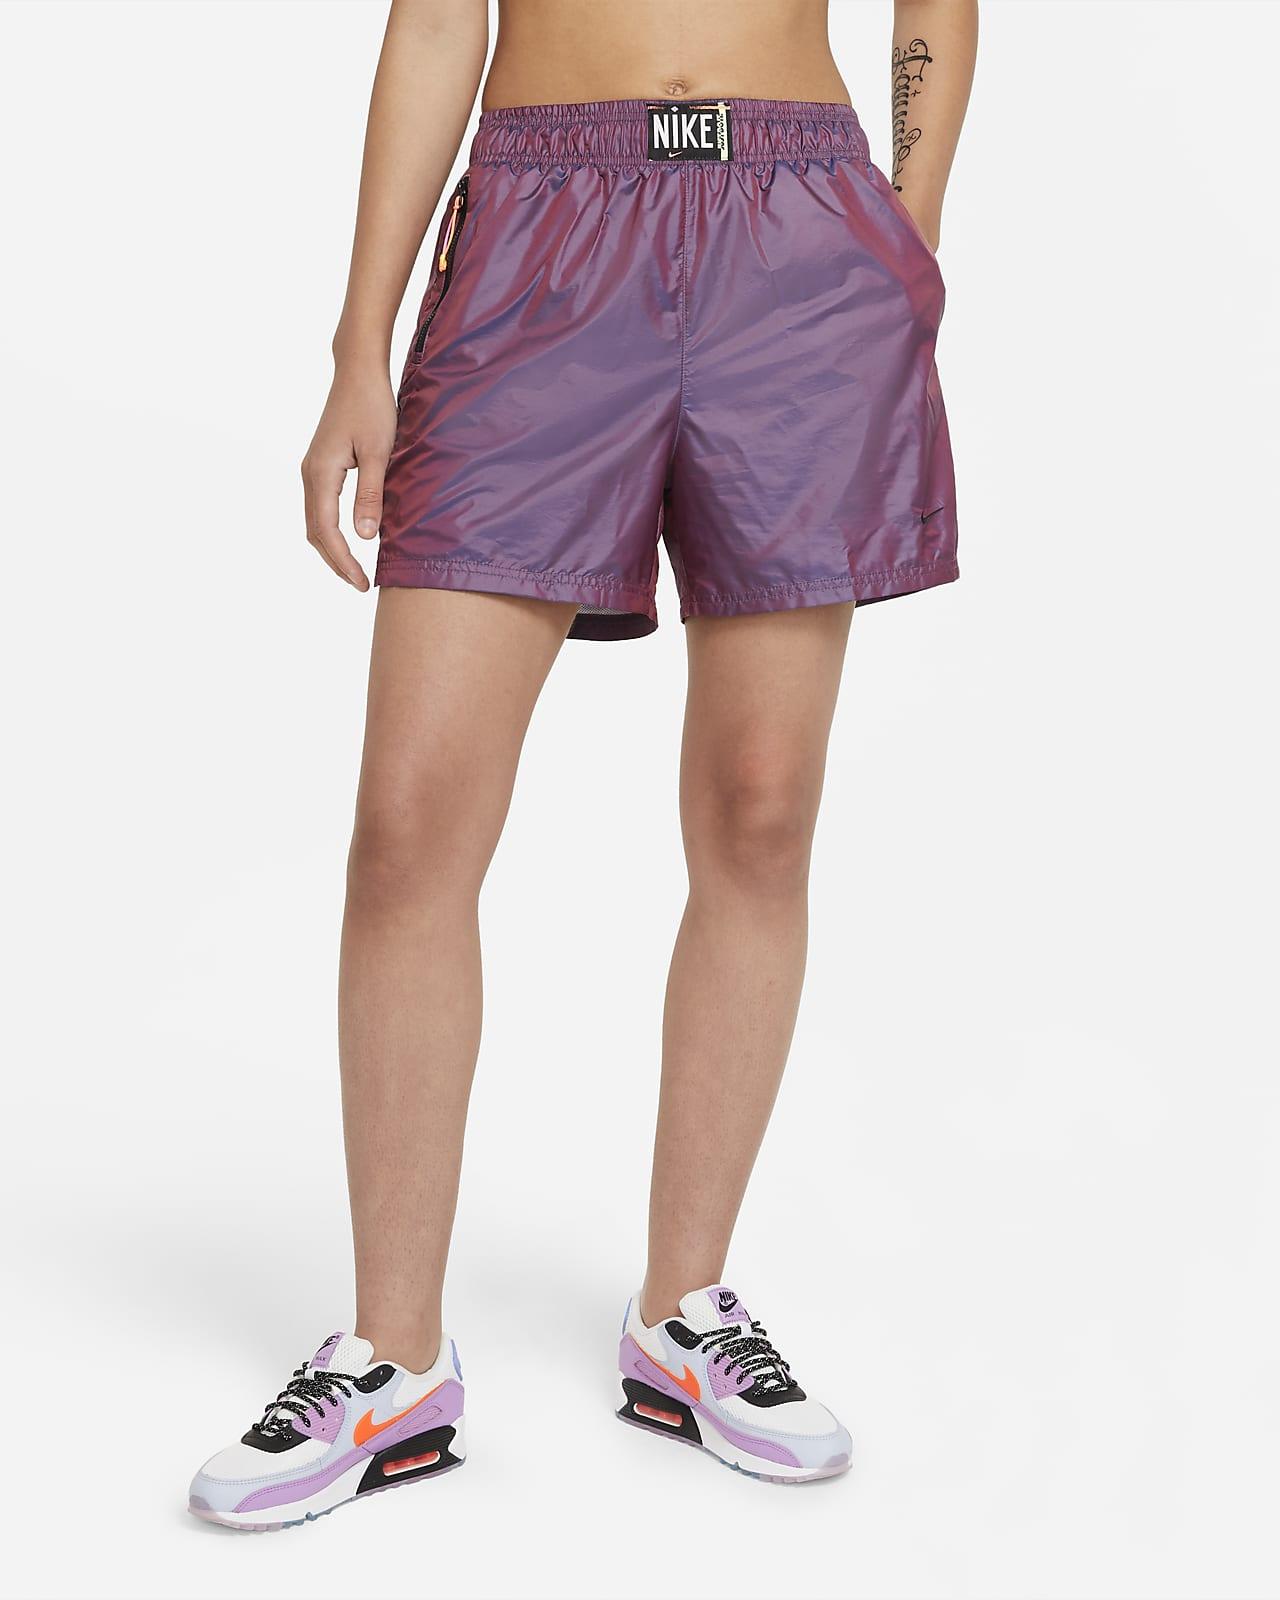 Женские шорты из тканого материала Nike Sportswear